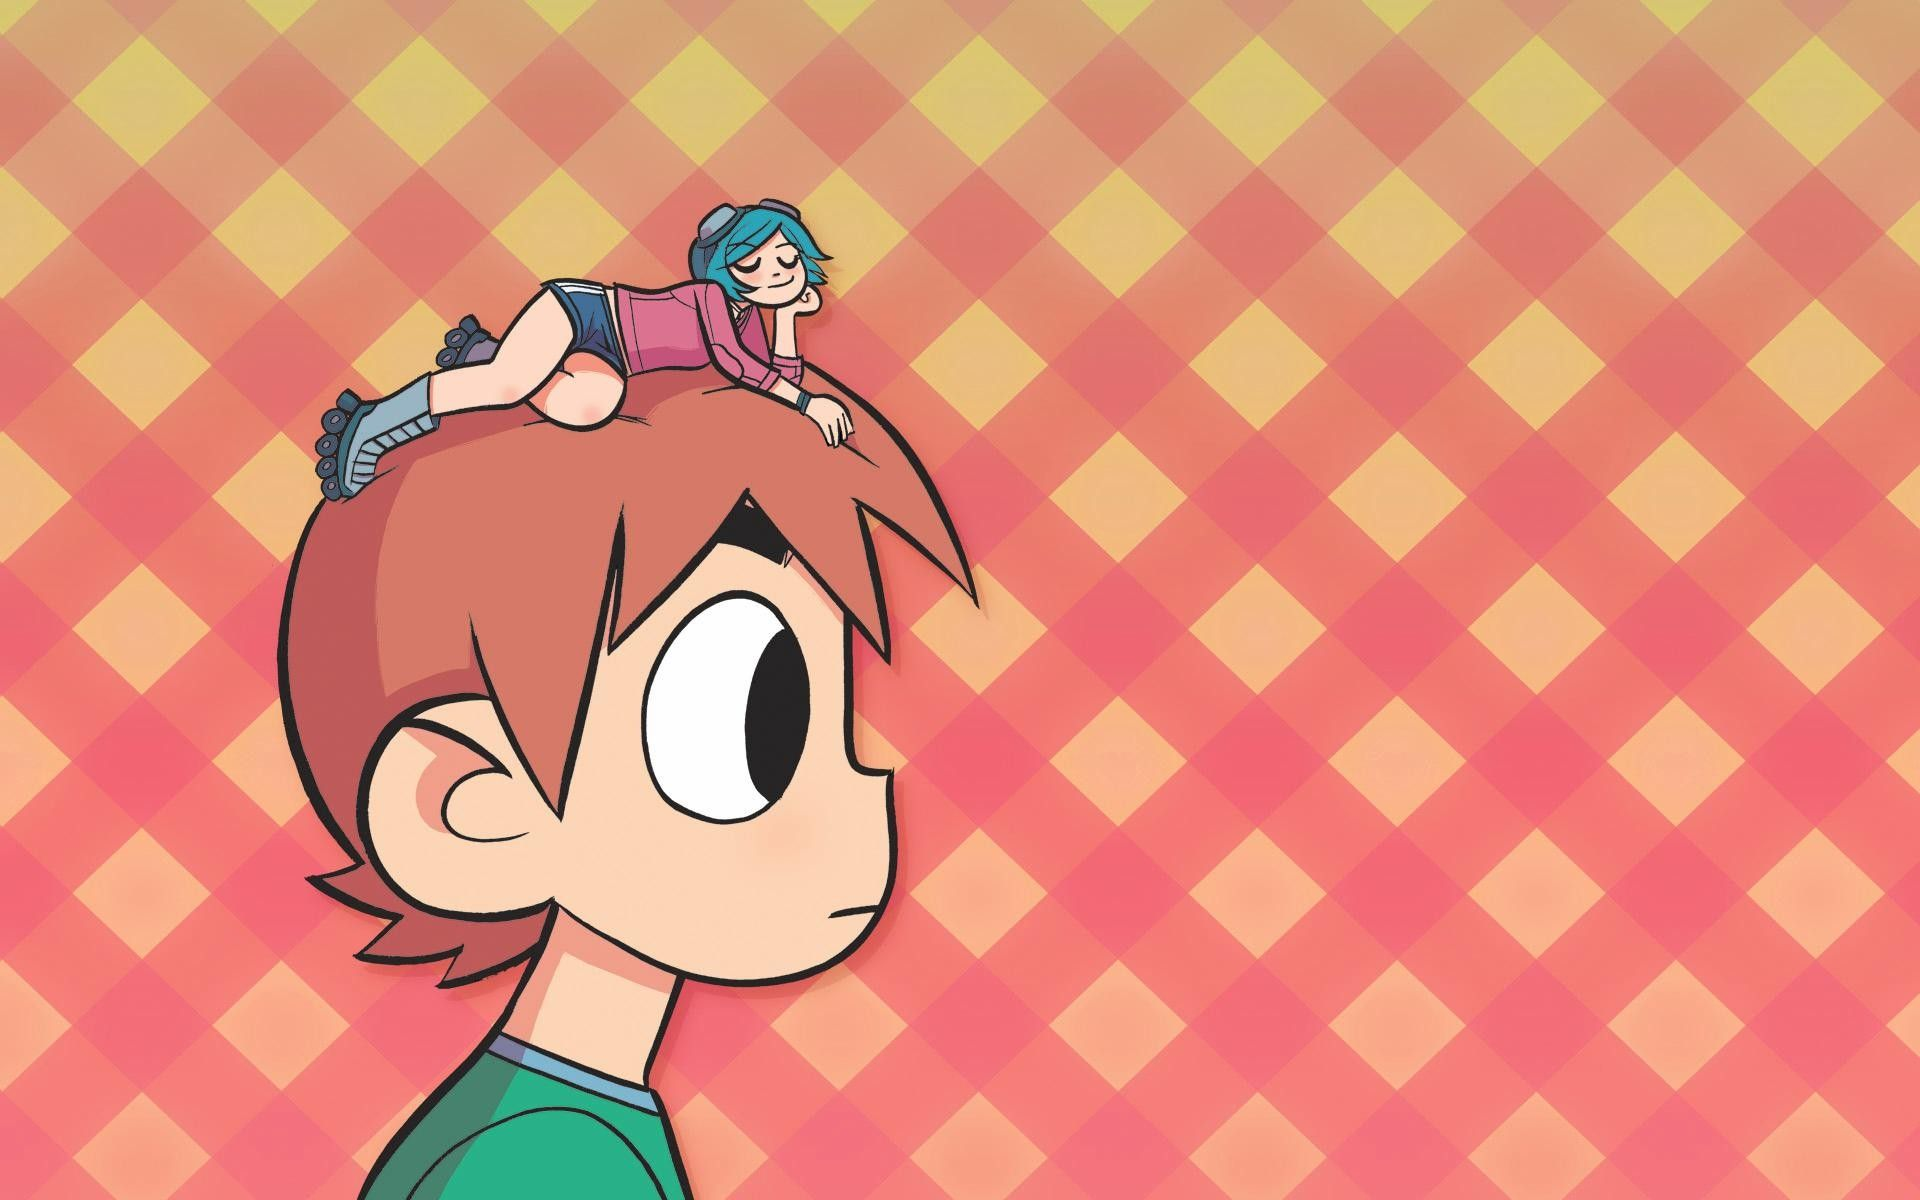 Lil Uzi Vert Vs The World Wallpapers Top Free Lil Uzi Vert Vs The World Backgrounds Wallpaperaccess 1080 x 1350 jpeg 256 кб. lil uzi vert vs the world wallpapers